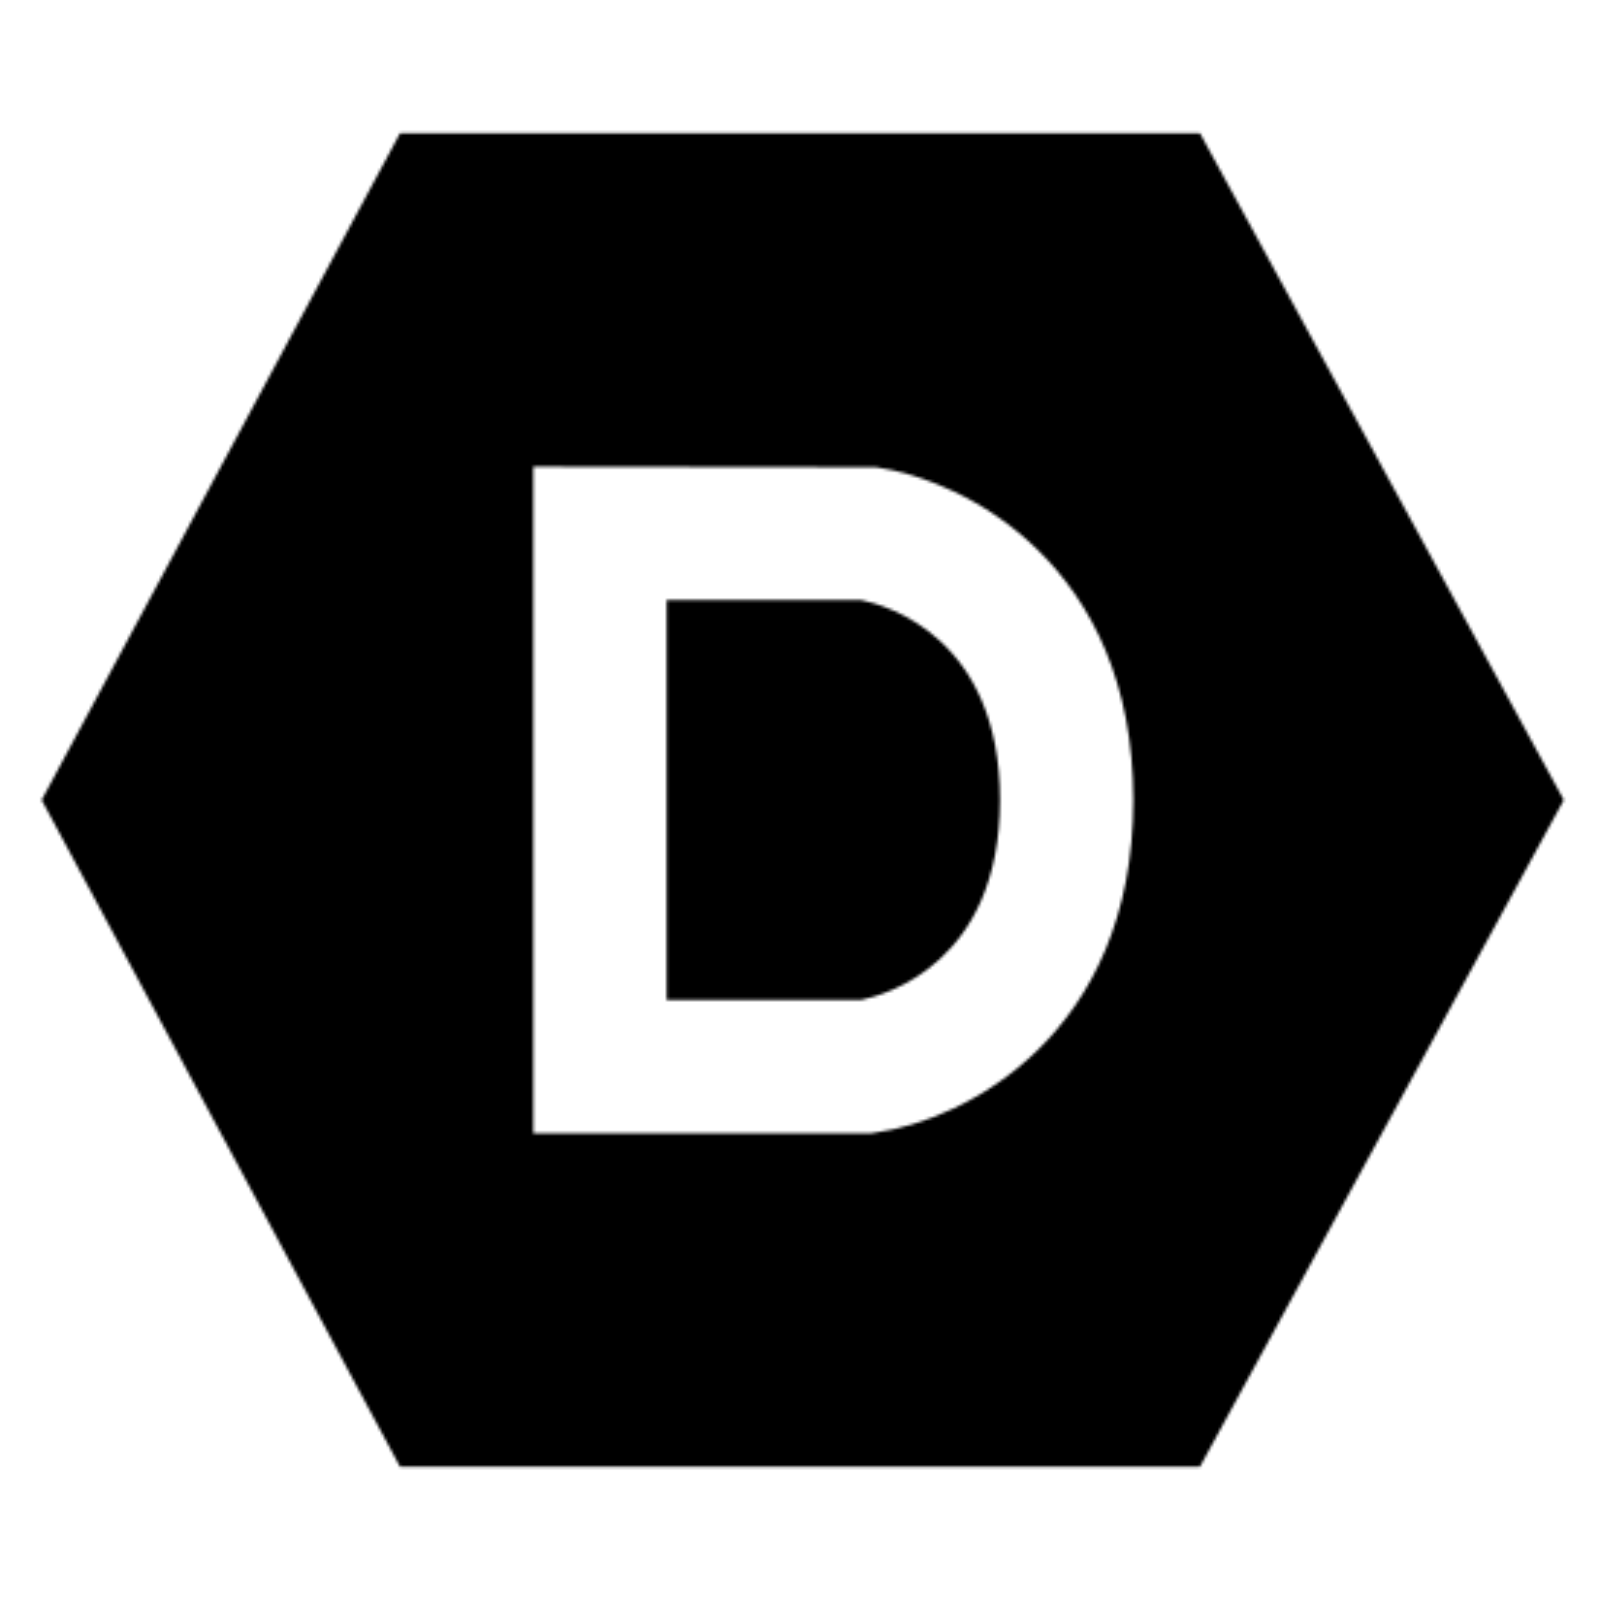 Dev Post icon